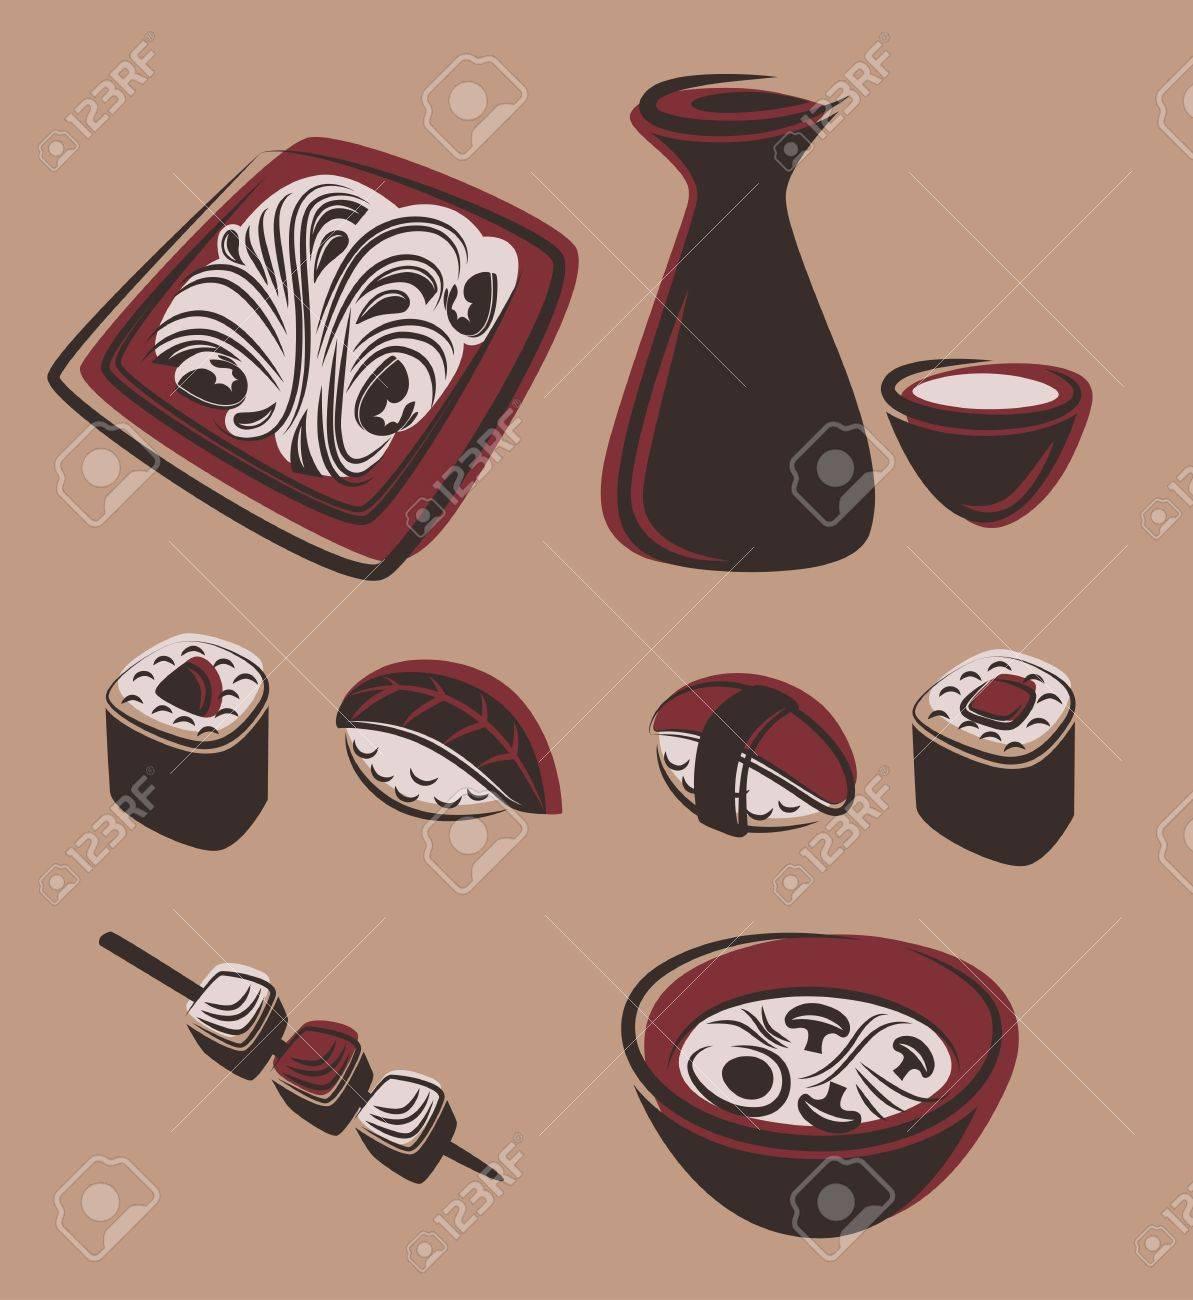 food and dish symbols Stock Vector - 19236739